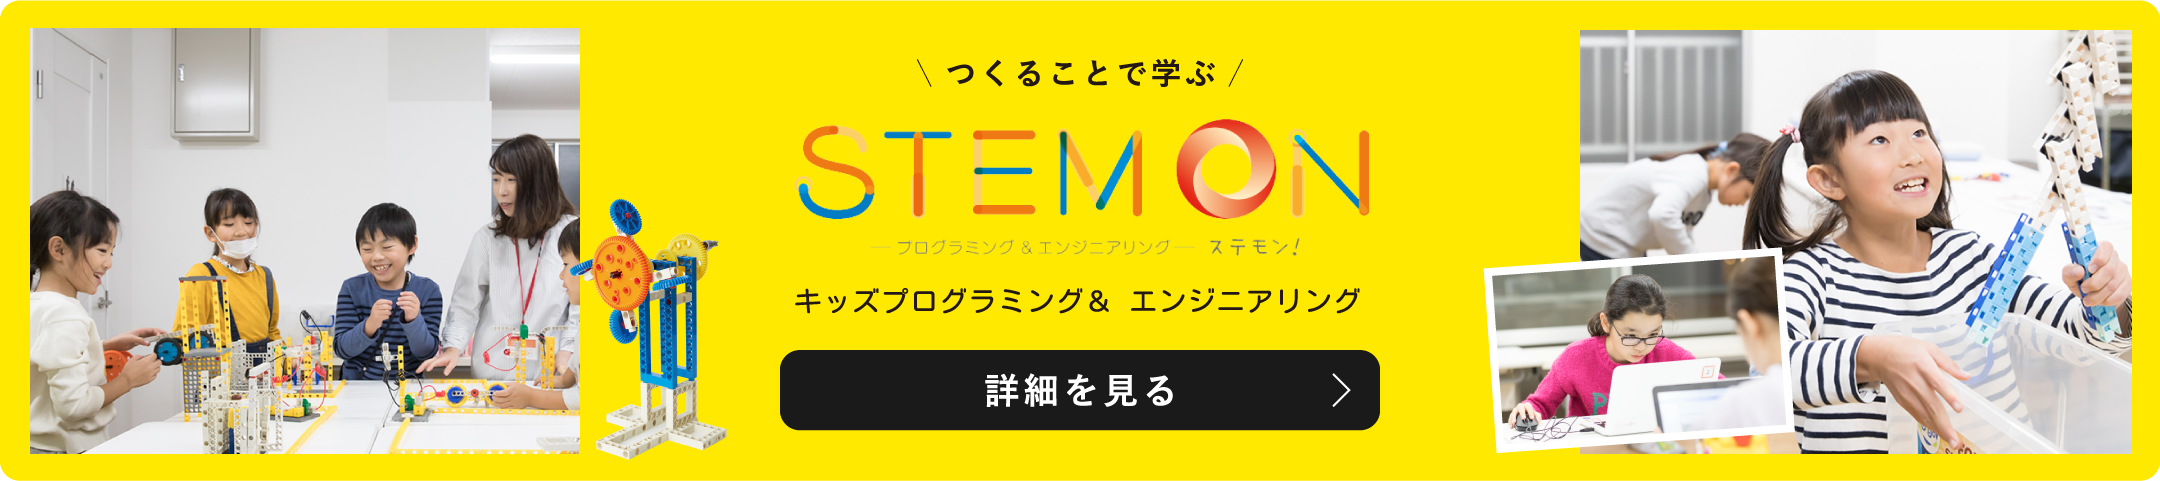 STEAMON